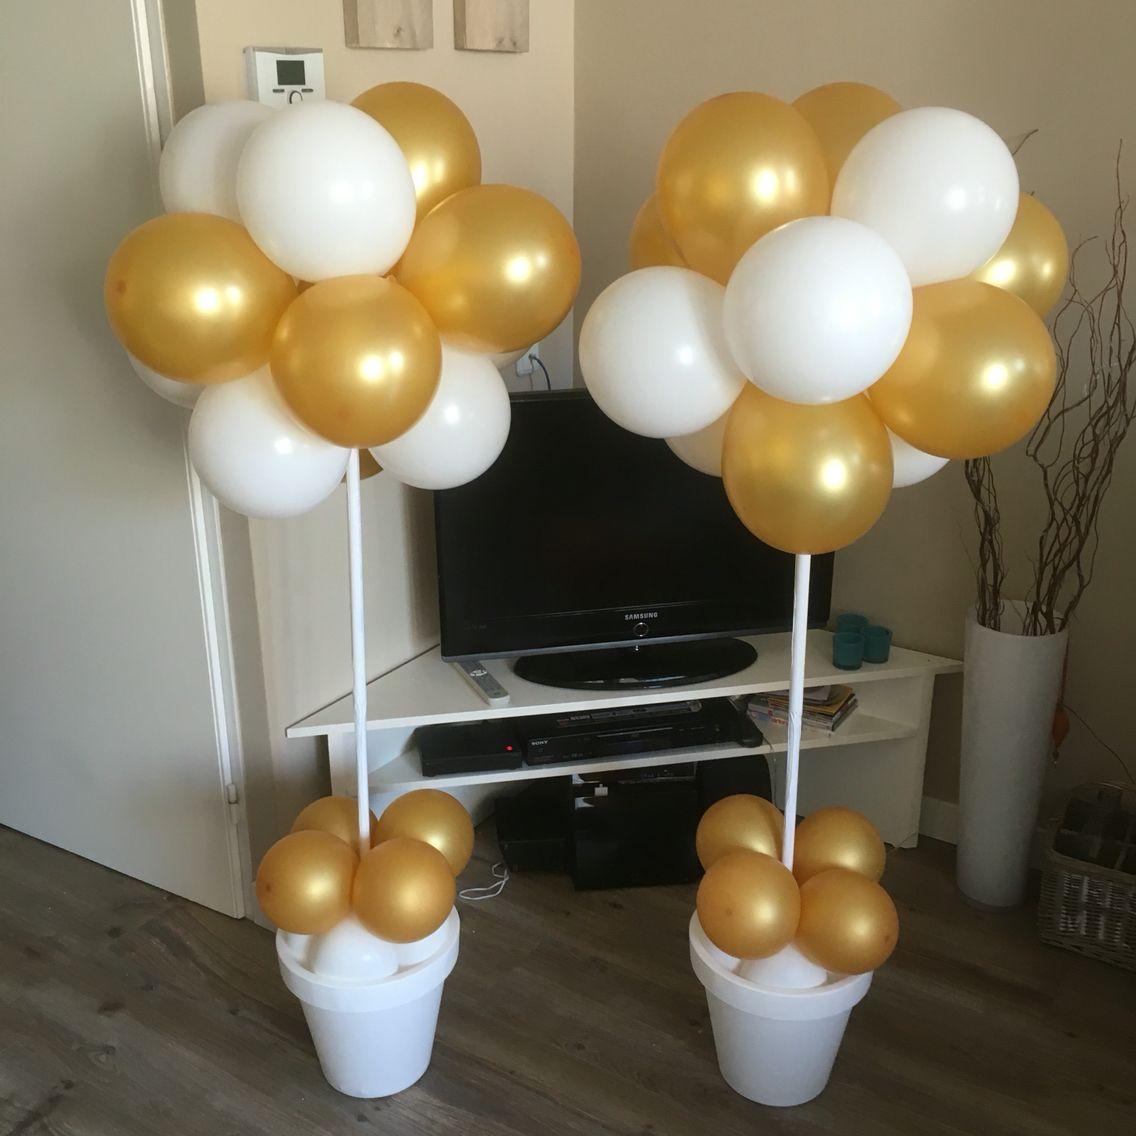 Ballonnen in pot 50 jaar getrouwd 50 jaar pinterest for Ballonnen versiering zelf maken